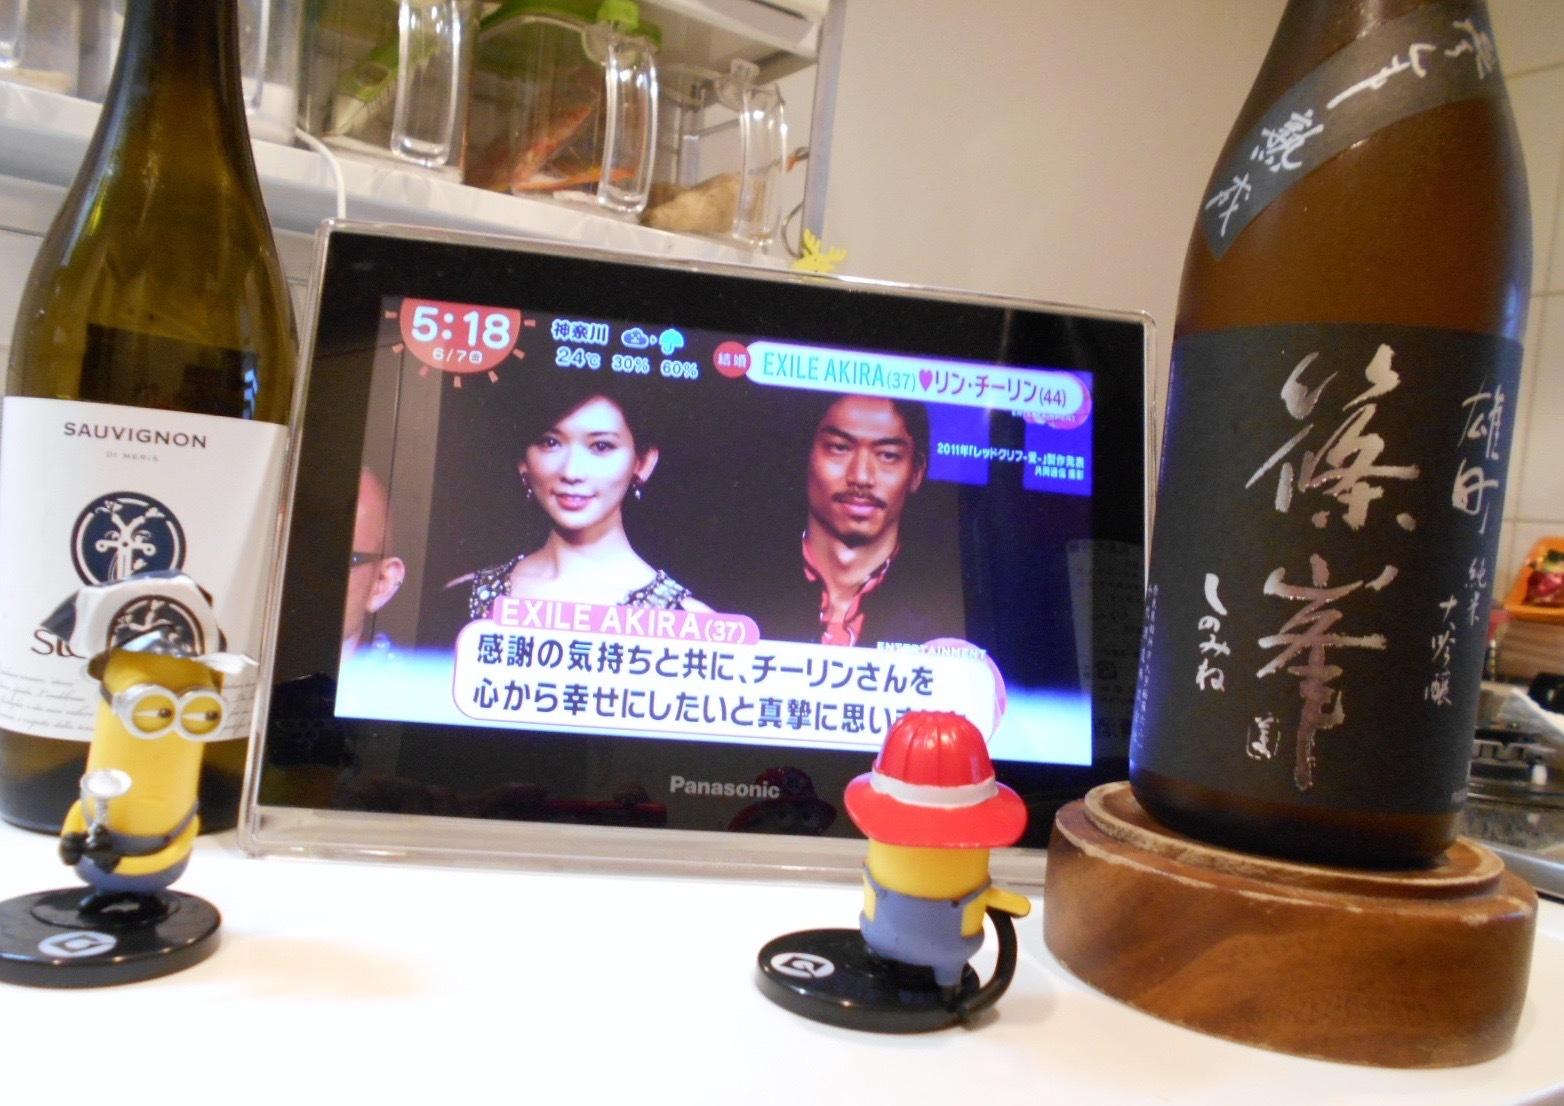 shinomine_jundai_omachi_sannen27by1_1.jpg